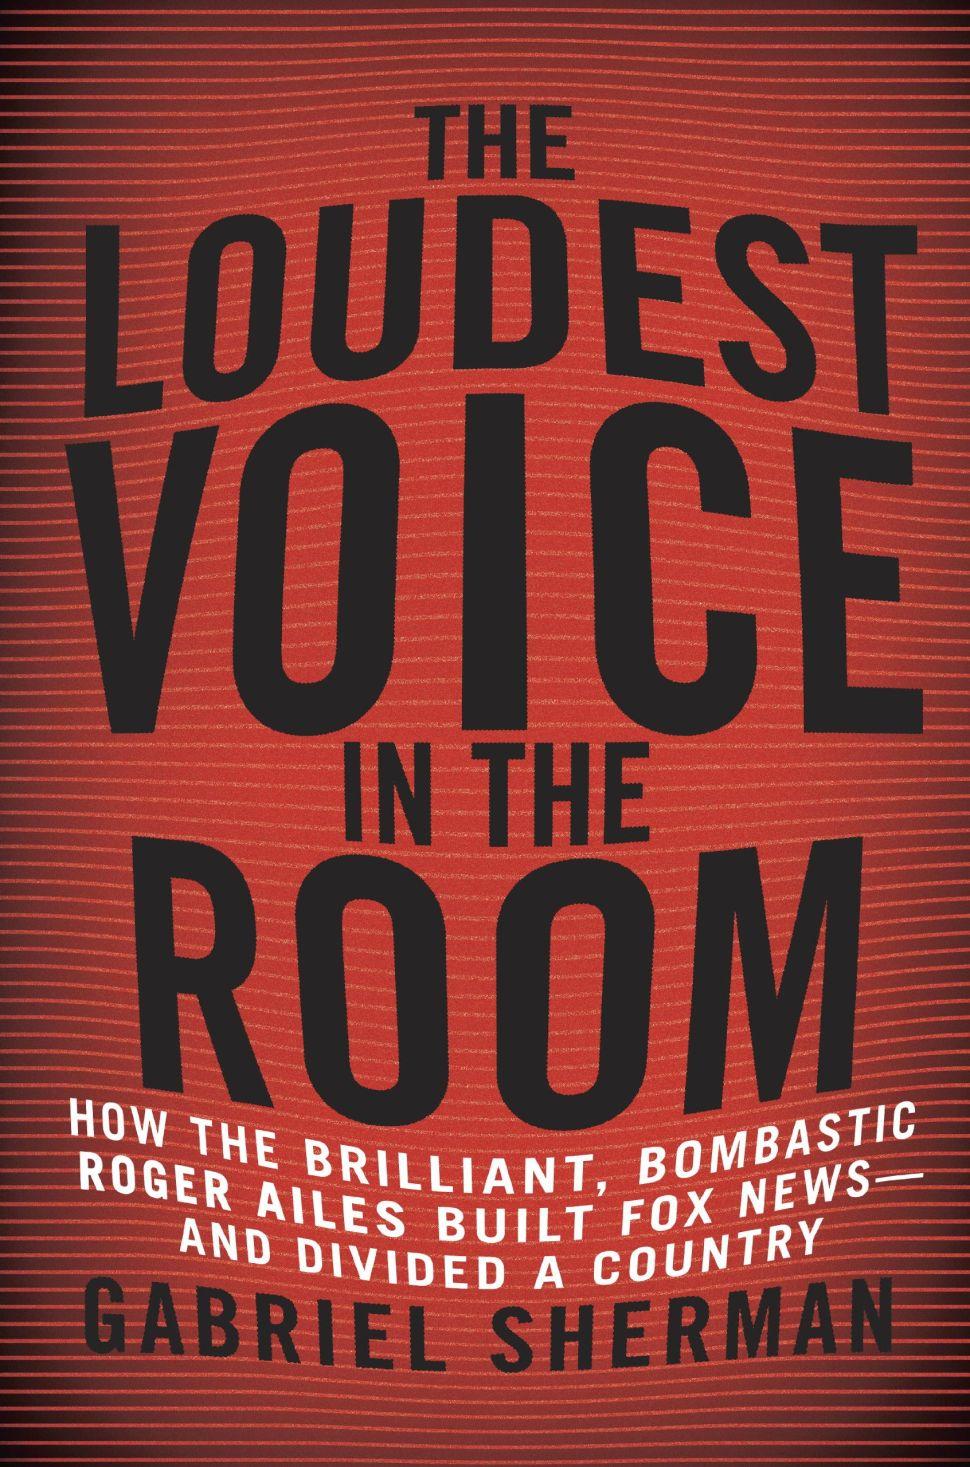 A Roomful of Loud Voices: Gabriel Sherman's Publication Week